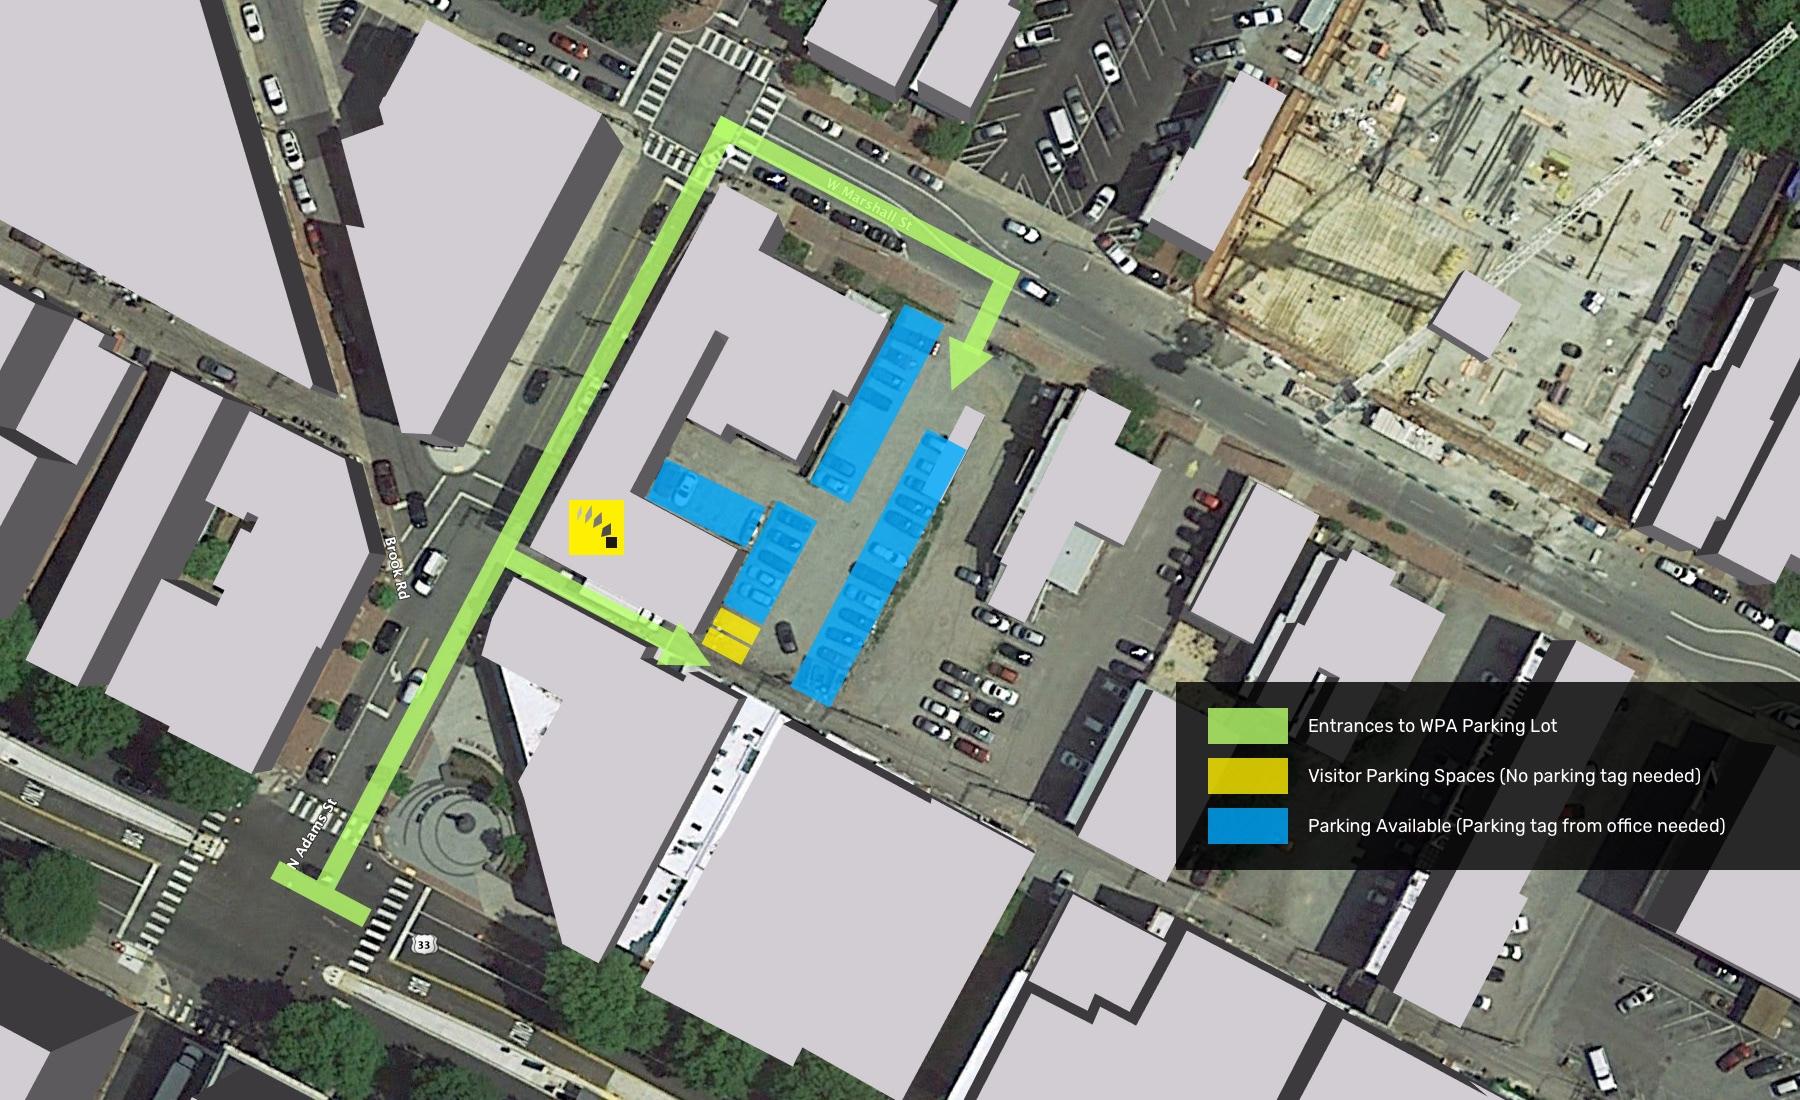 WPA Parking lot map